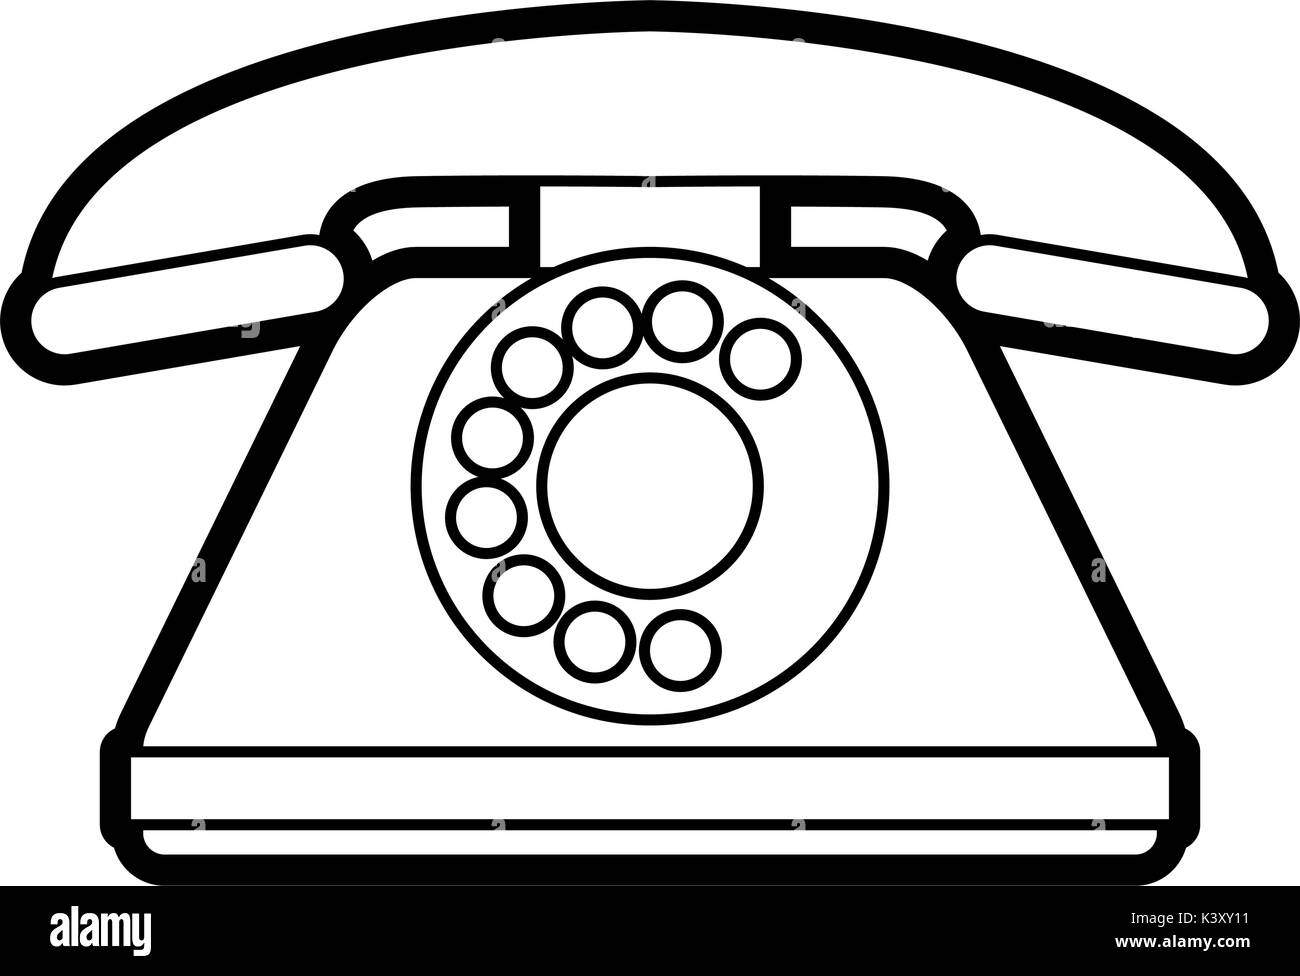 Diseño de teléfono retro aislados Imagen De Stock